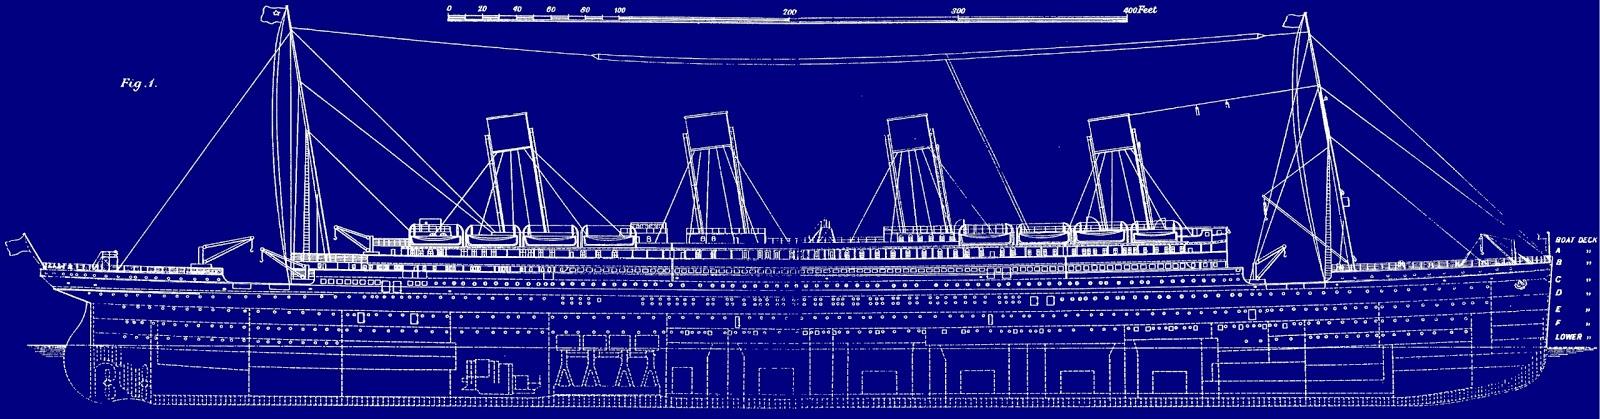 Dibarqepi blueprints blueprint del titanic malvernweather Gallery